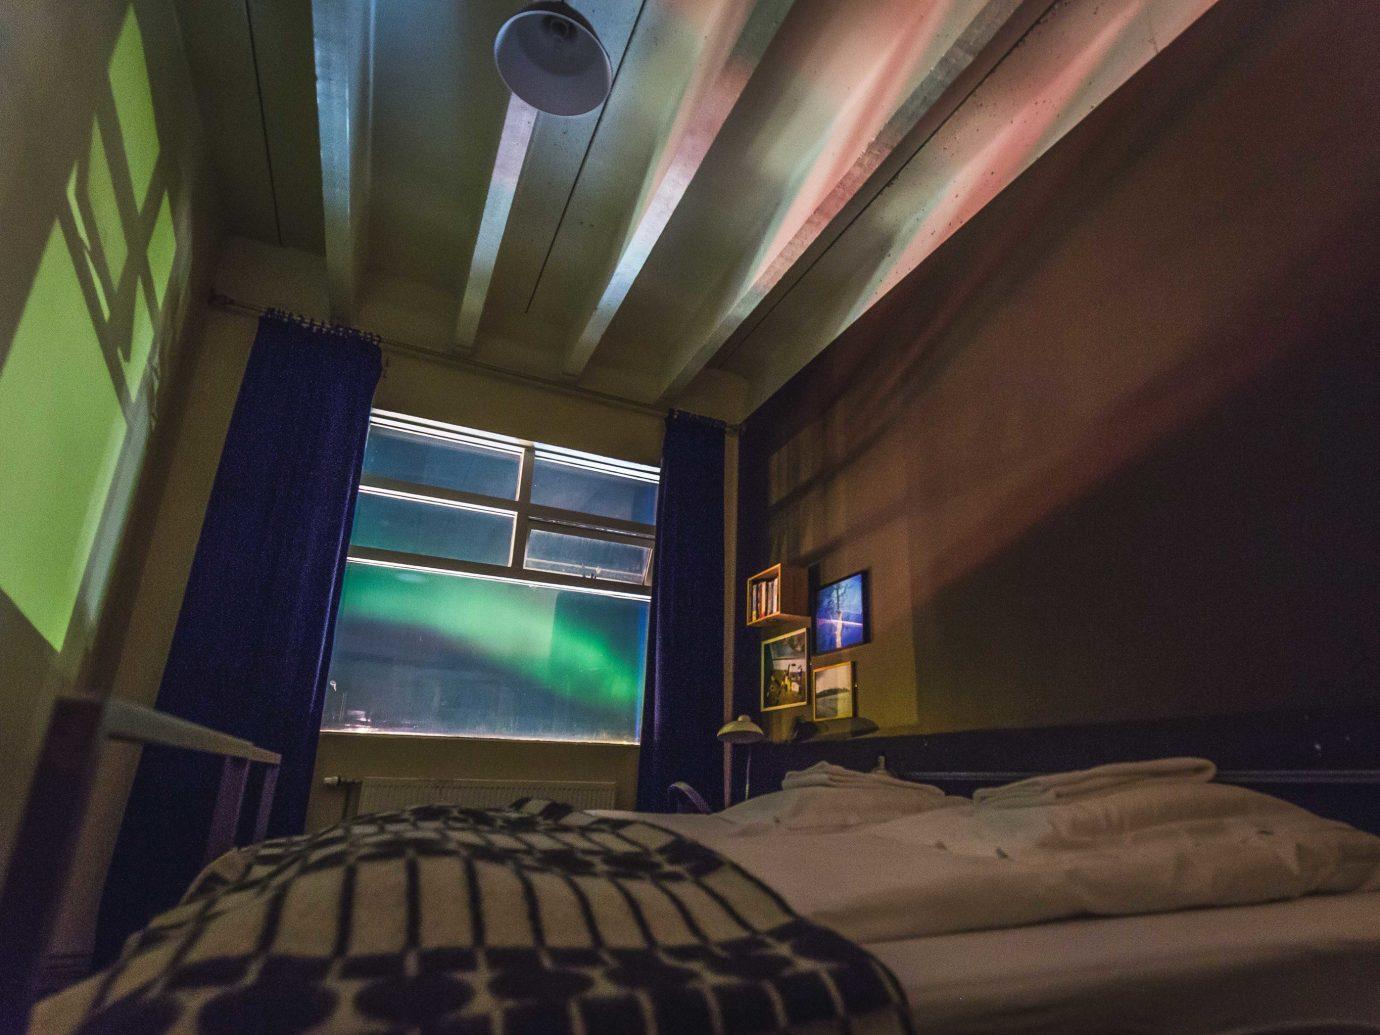 Iceland Trip Ideas indoor wall room ceiling bed light interior design screenshot living room Design